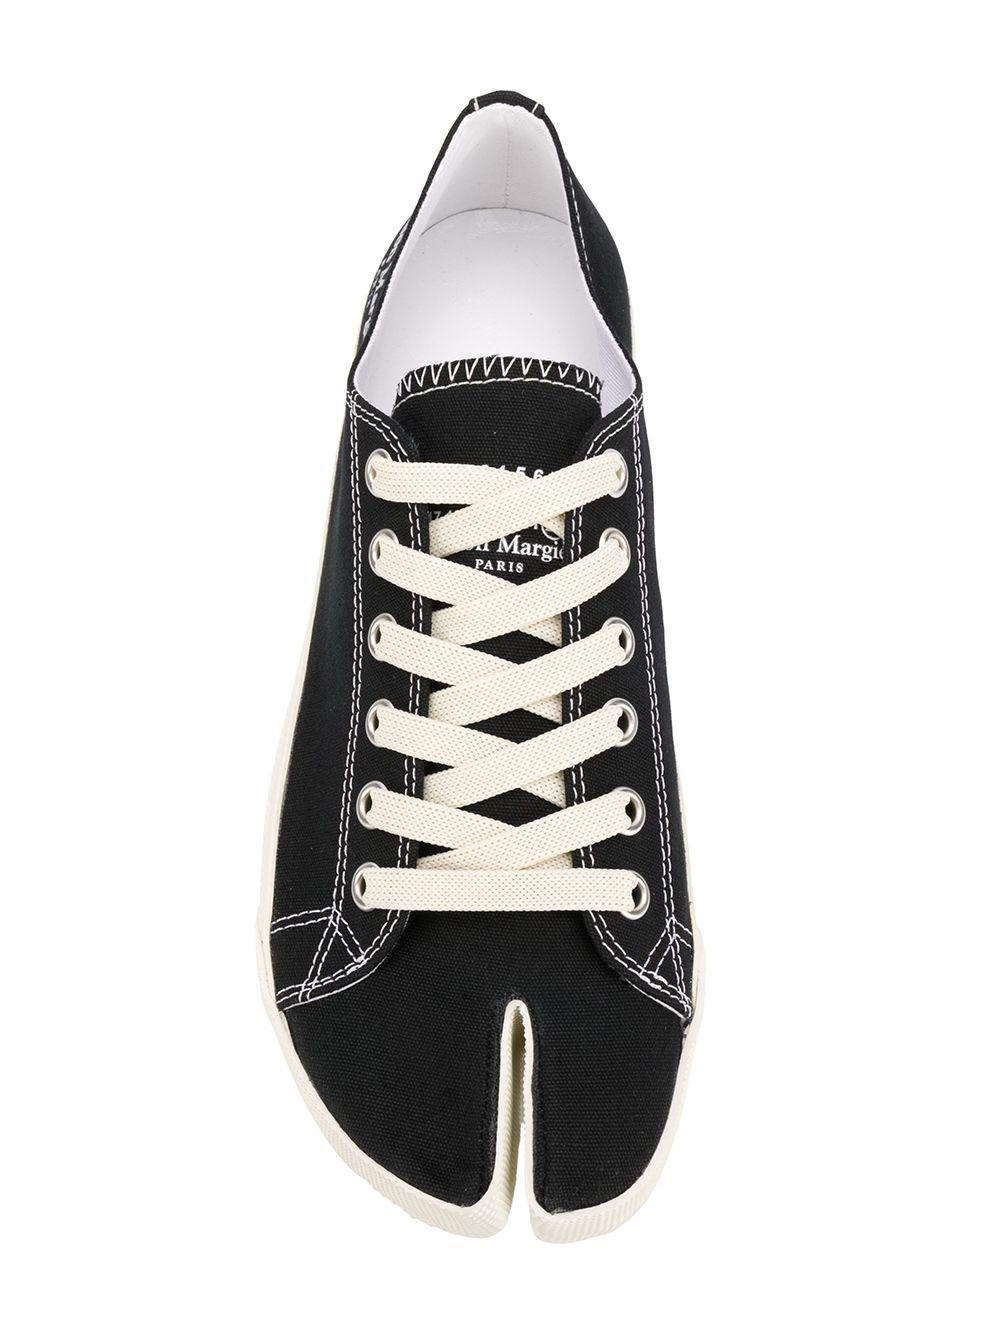 Maison Margiela tabi sneakers man black MAISON MARGIELA | Sneakers | S57WS0252 P1875T8013